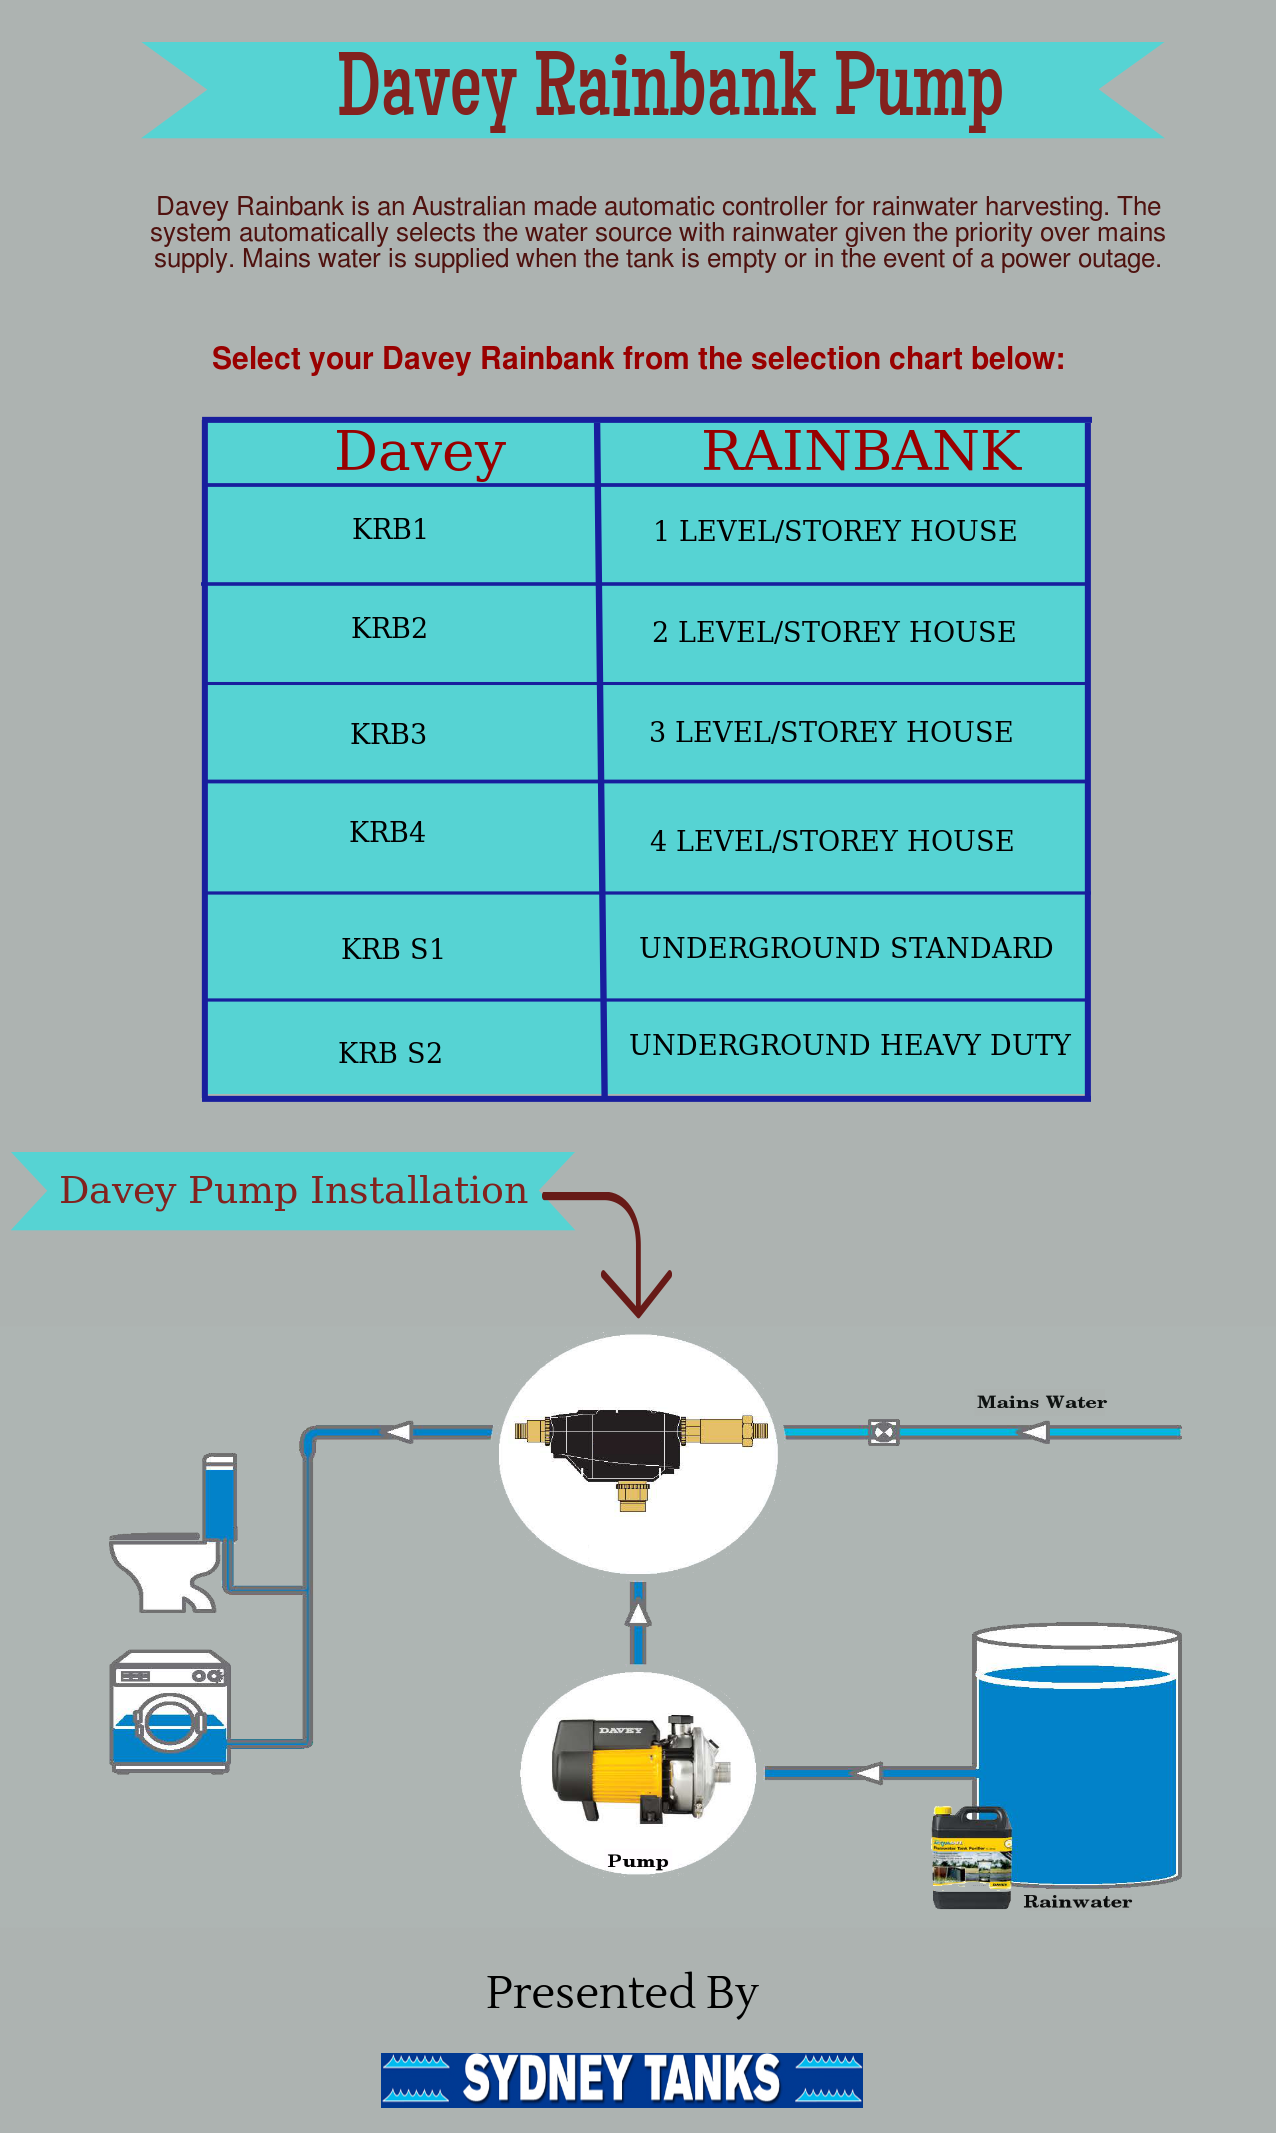 Davey Rainbank Pump Are Popular In Australia It Is Used For Rainwater Harvesting This Pump Is Extremely Easy Rain Water Tank Water Tank Rainwater Harvesting